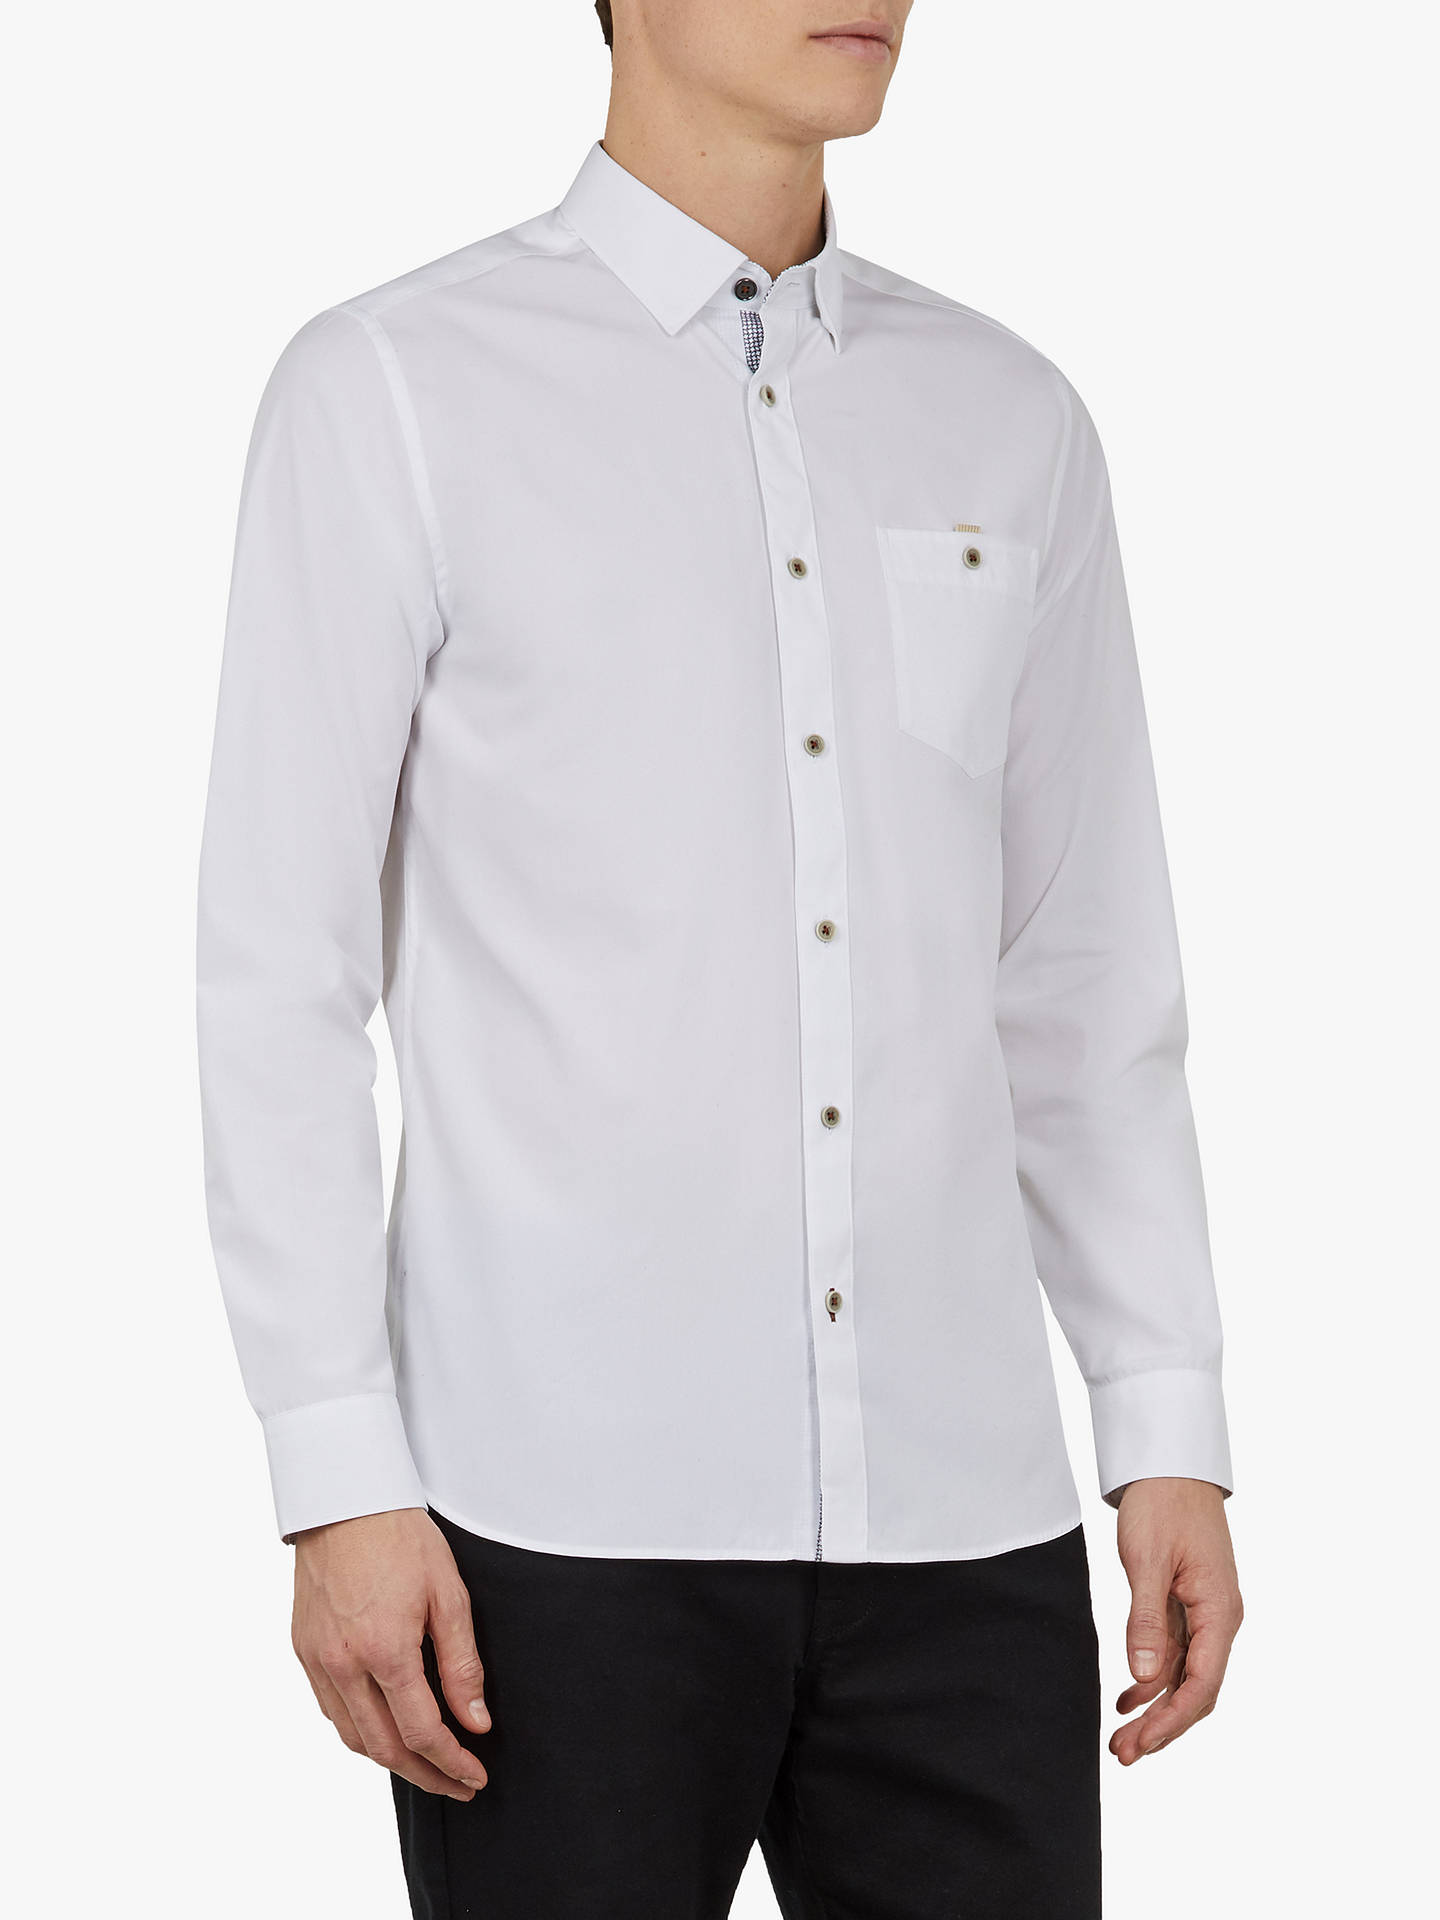 565e408fa3f188 Ted Baker Kickit Slim Fit Shirt at John Lewis   Partners